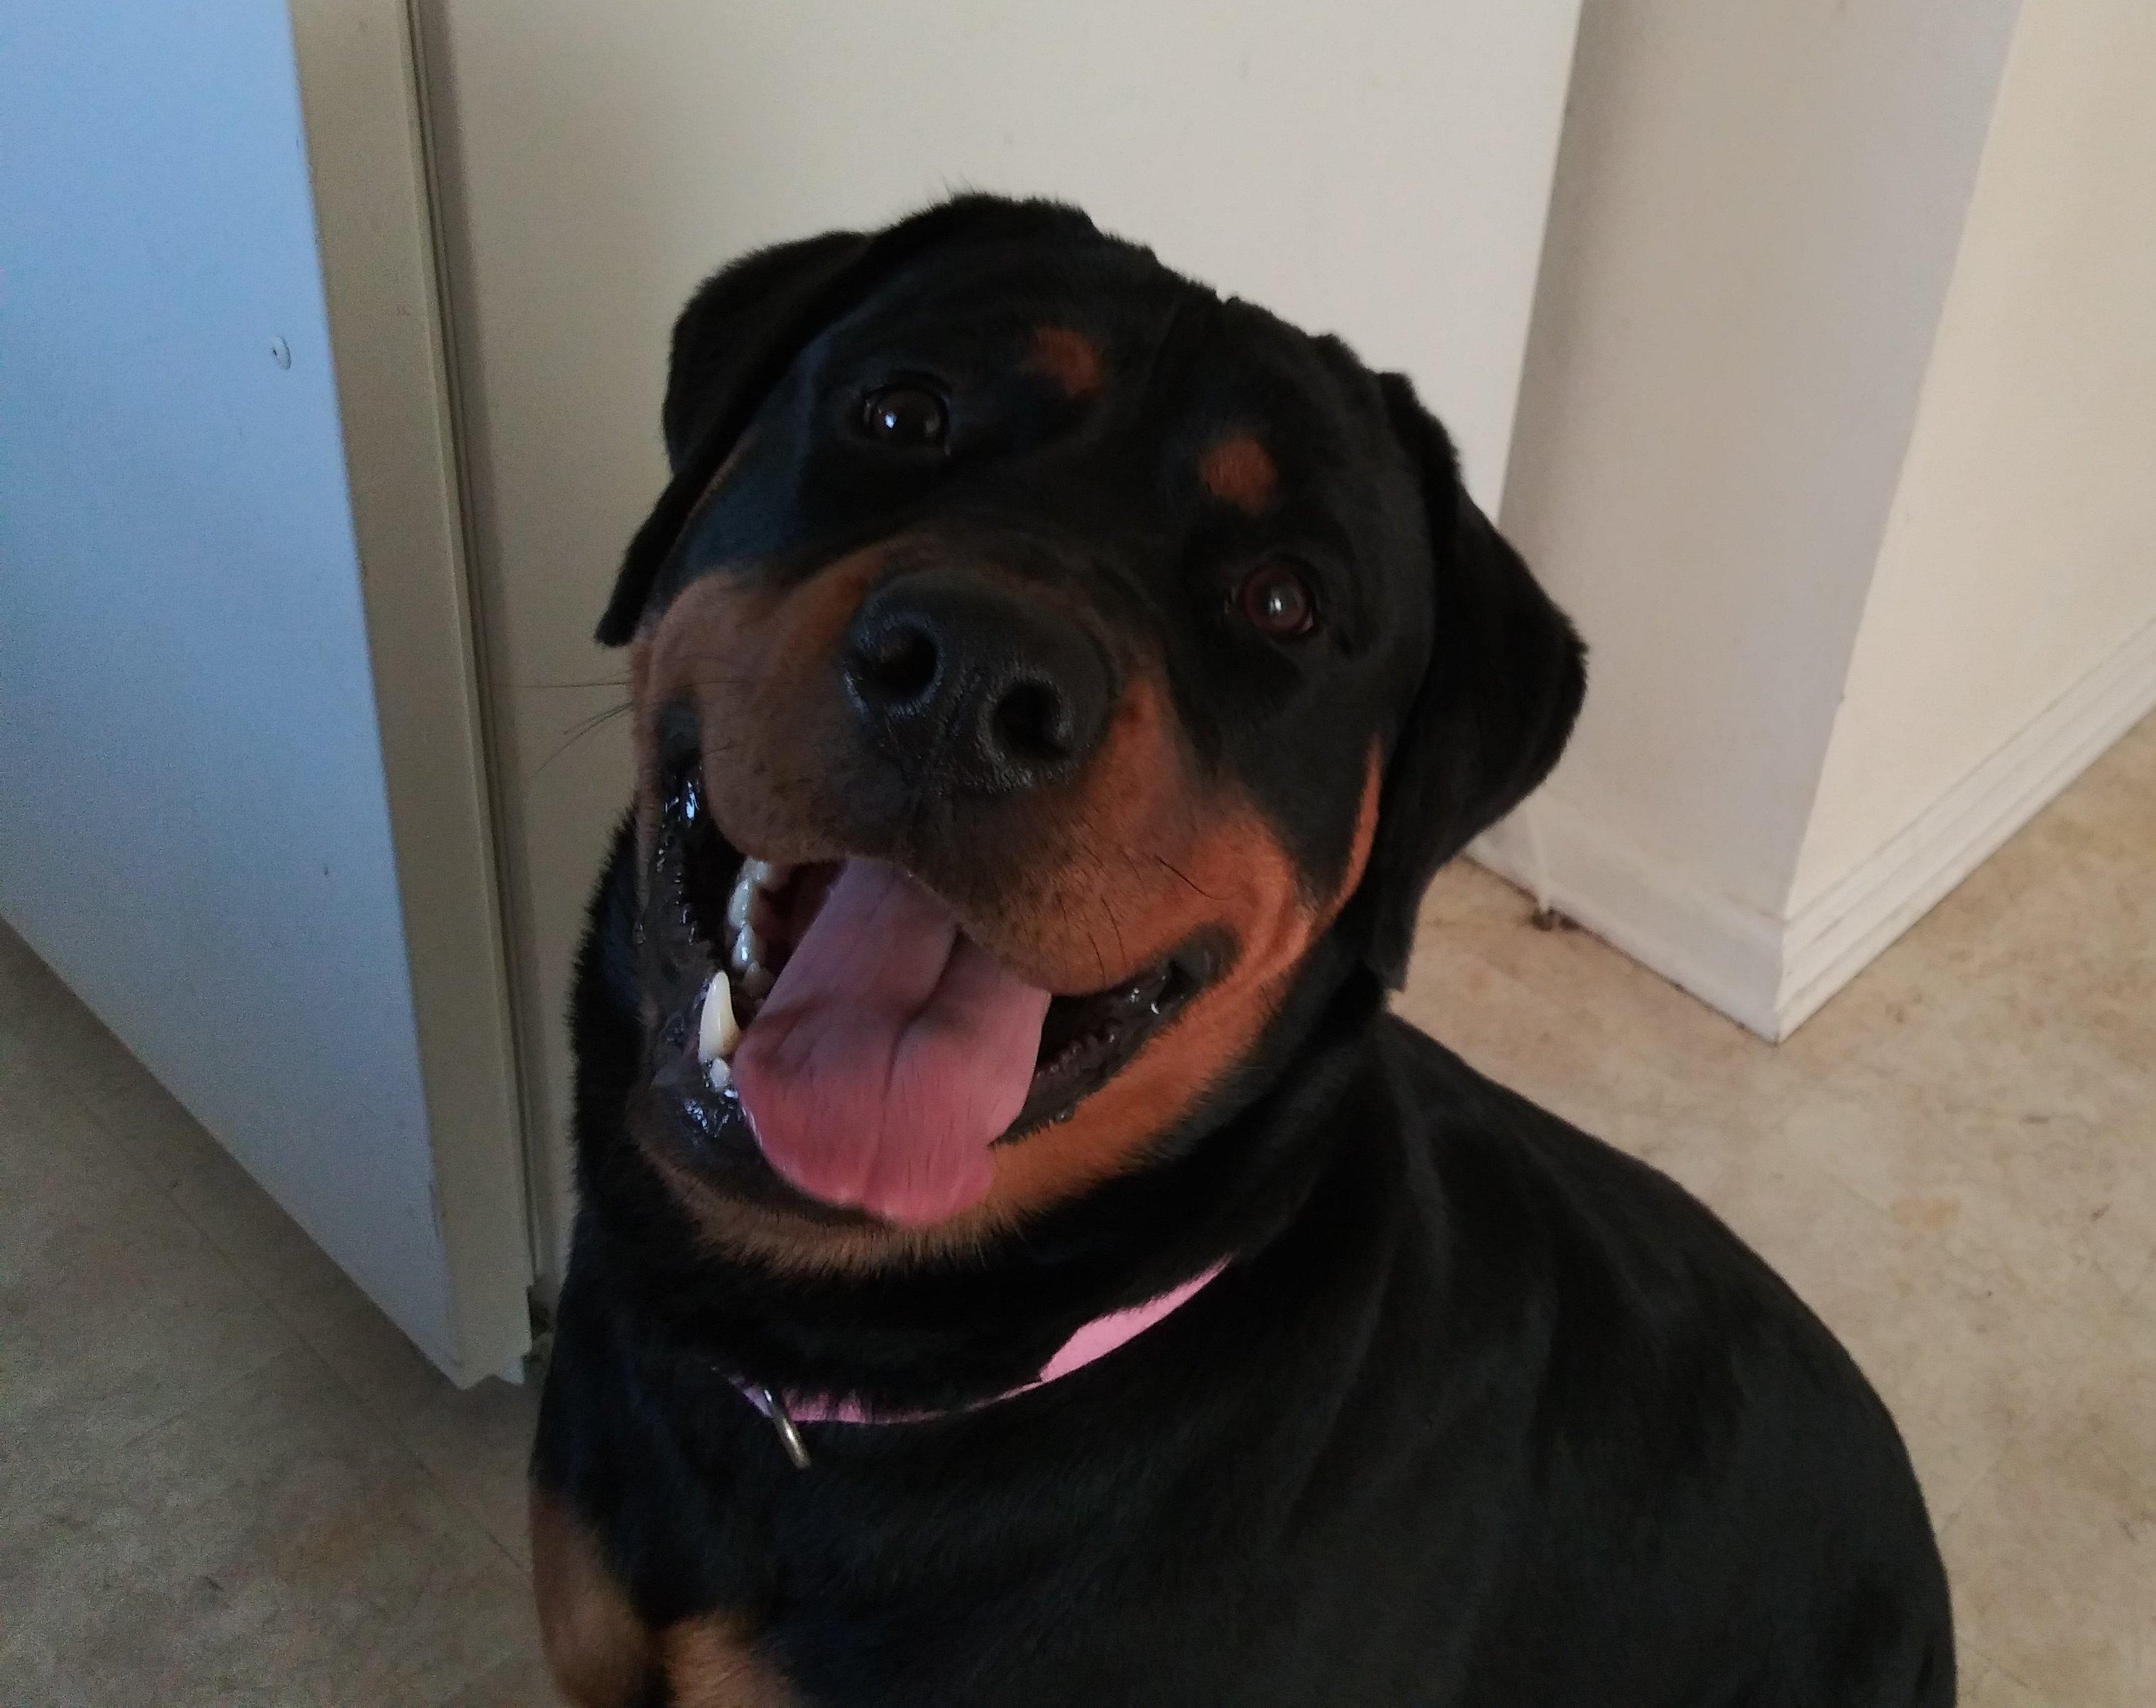 My sweet Rosie-20200620_075648_kindlephoto-47265621_1593614815115.jpg